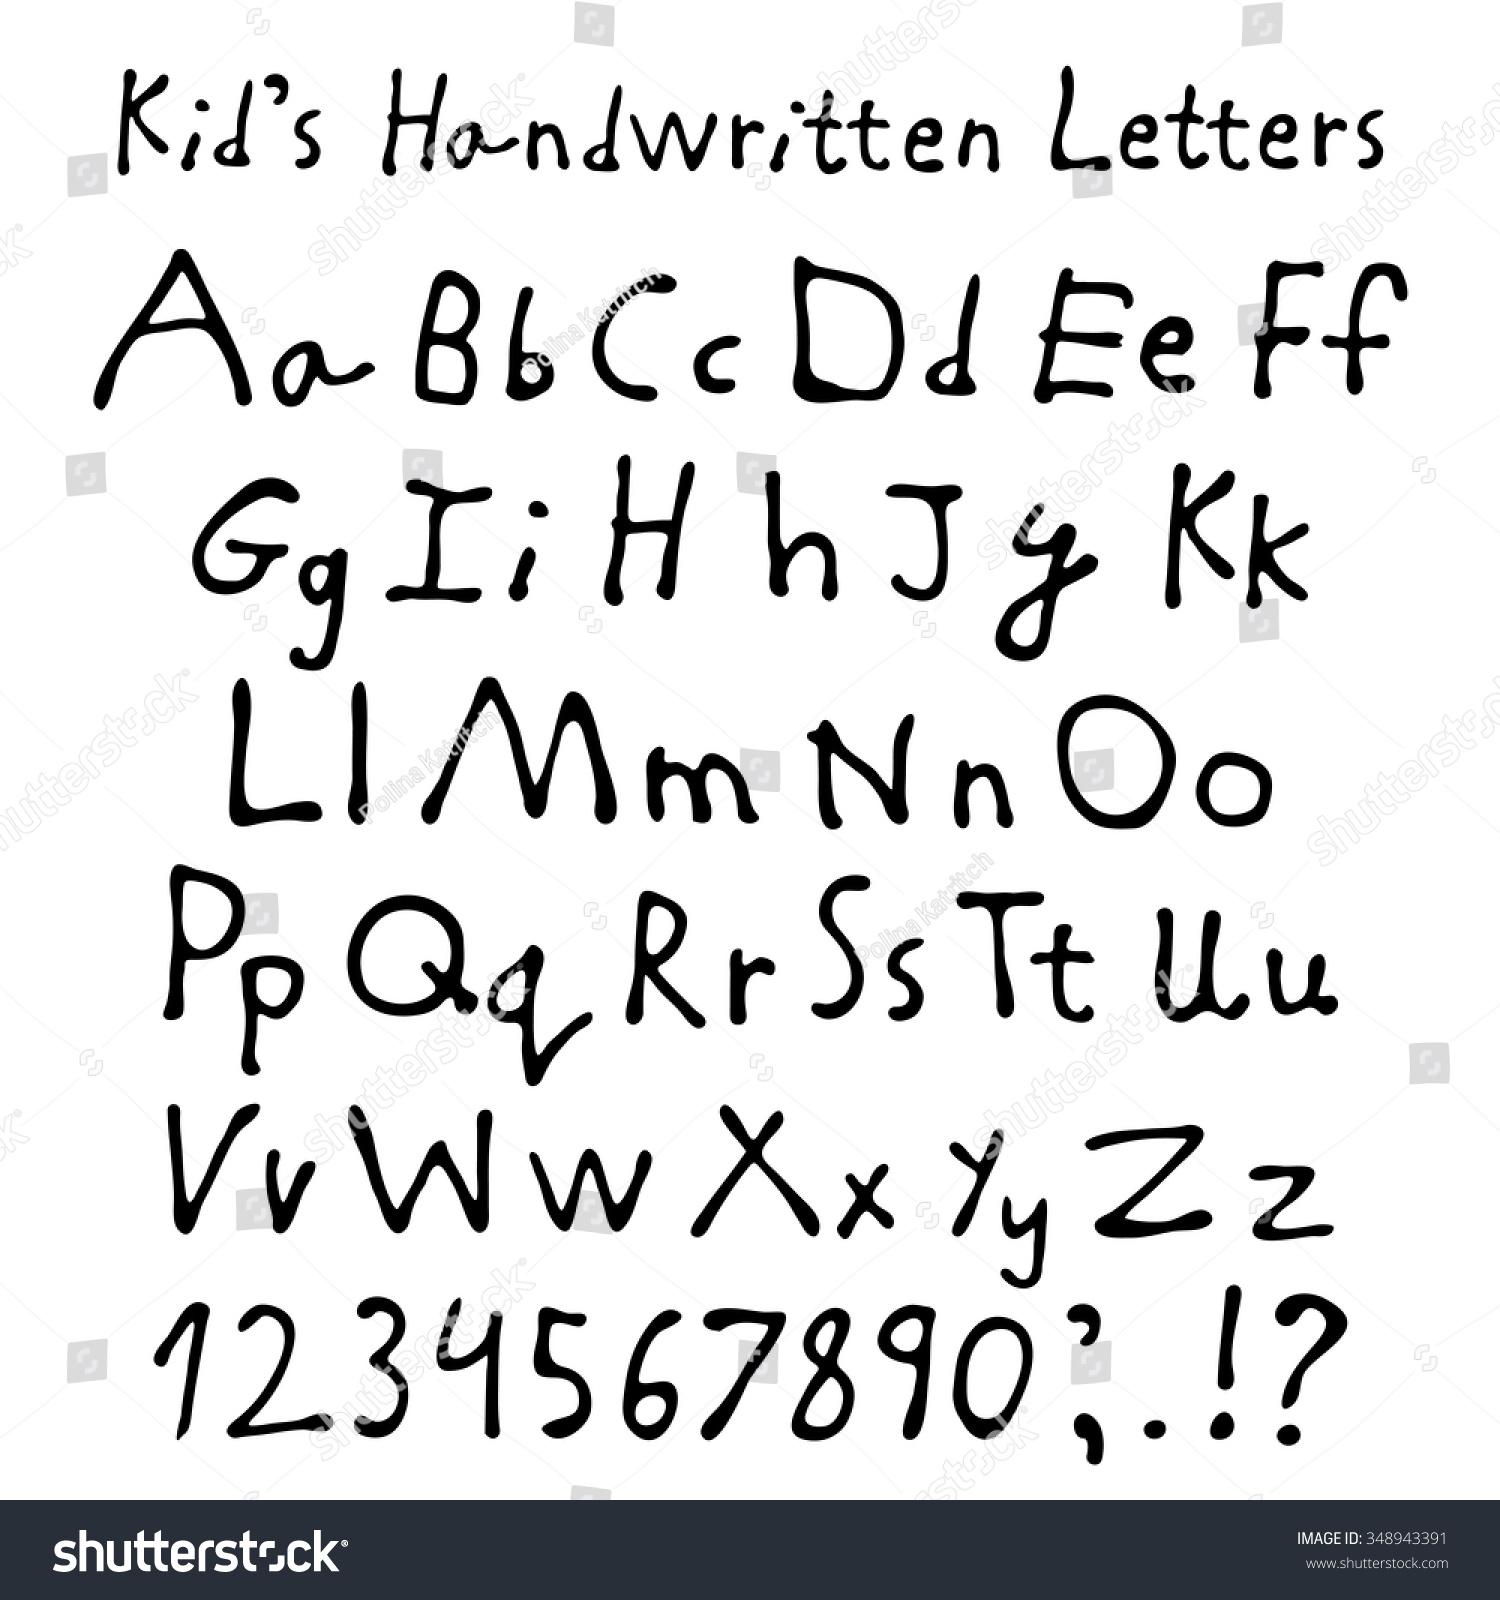 Worksheets Script Alphabet For Kids kids handwritten letters full alphabet numbers stock vector and children script font